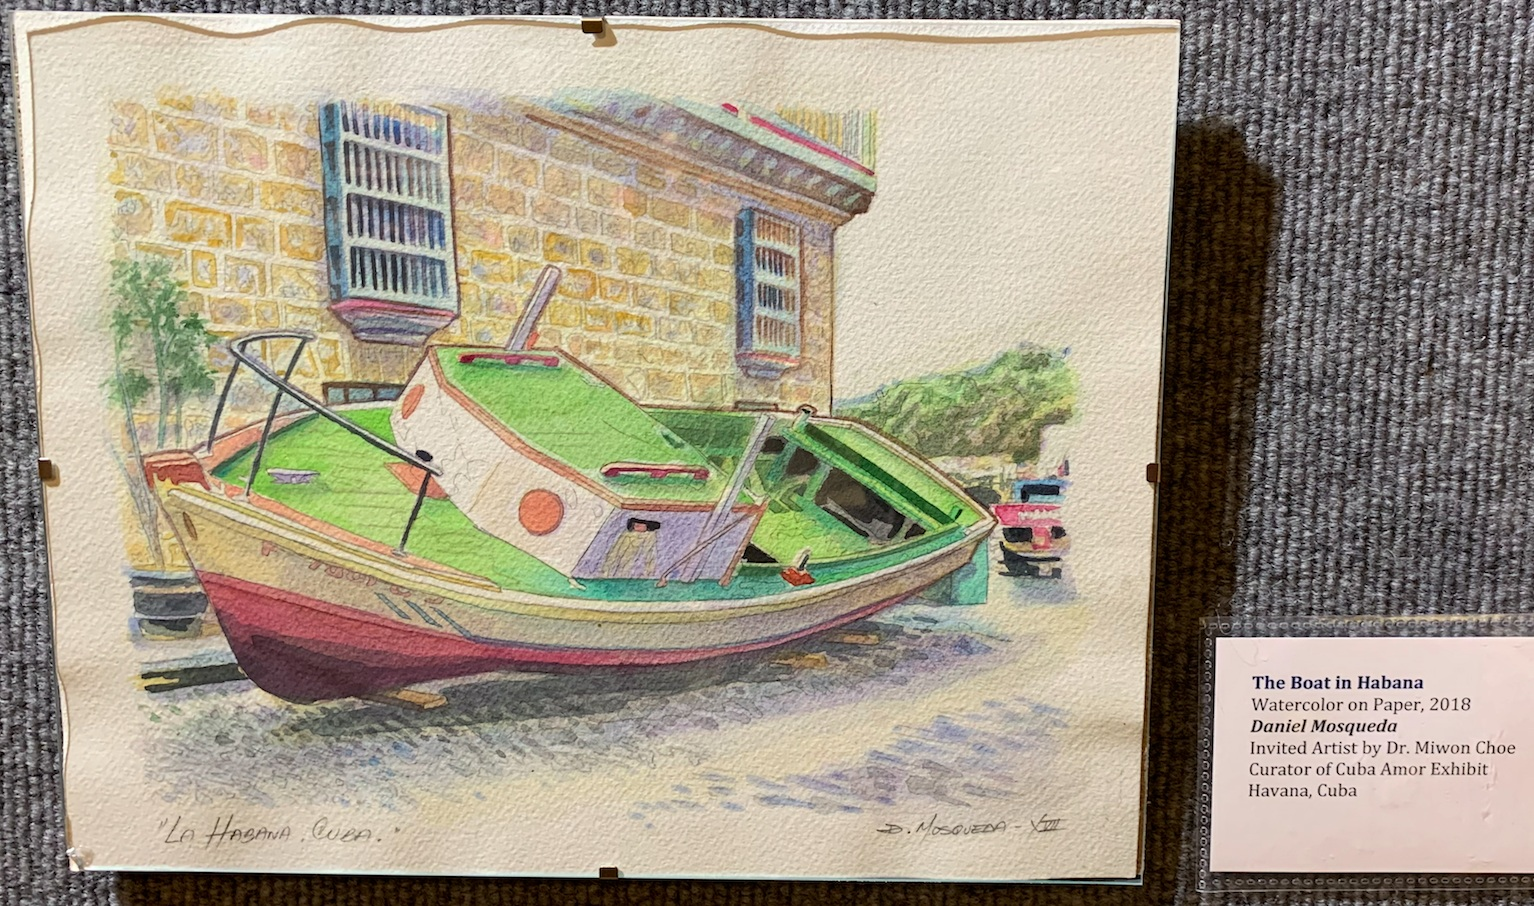 The Boat in Habana